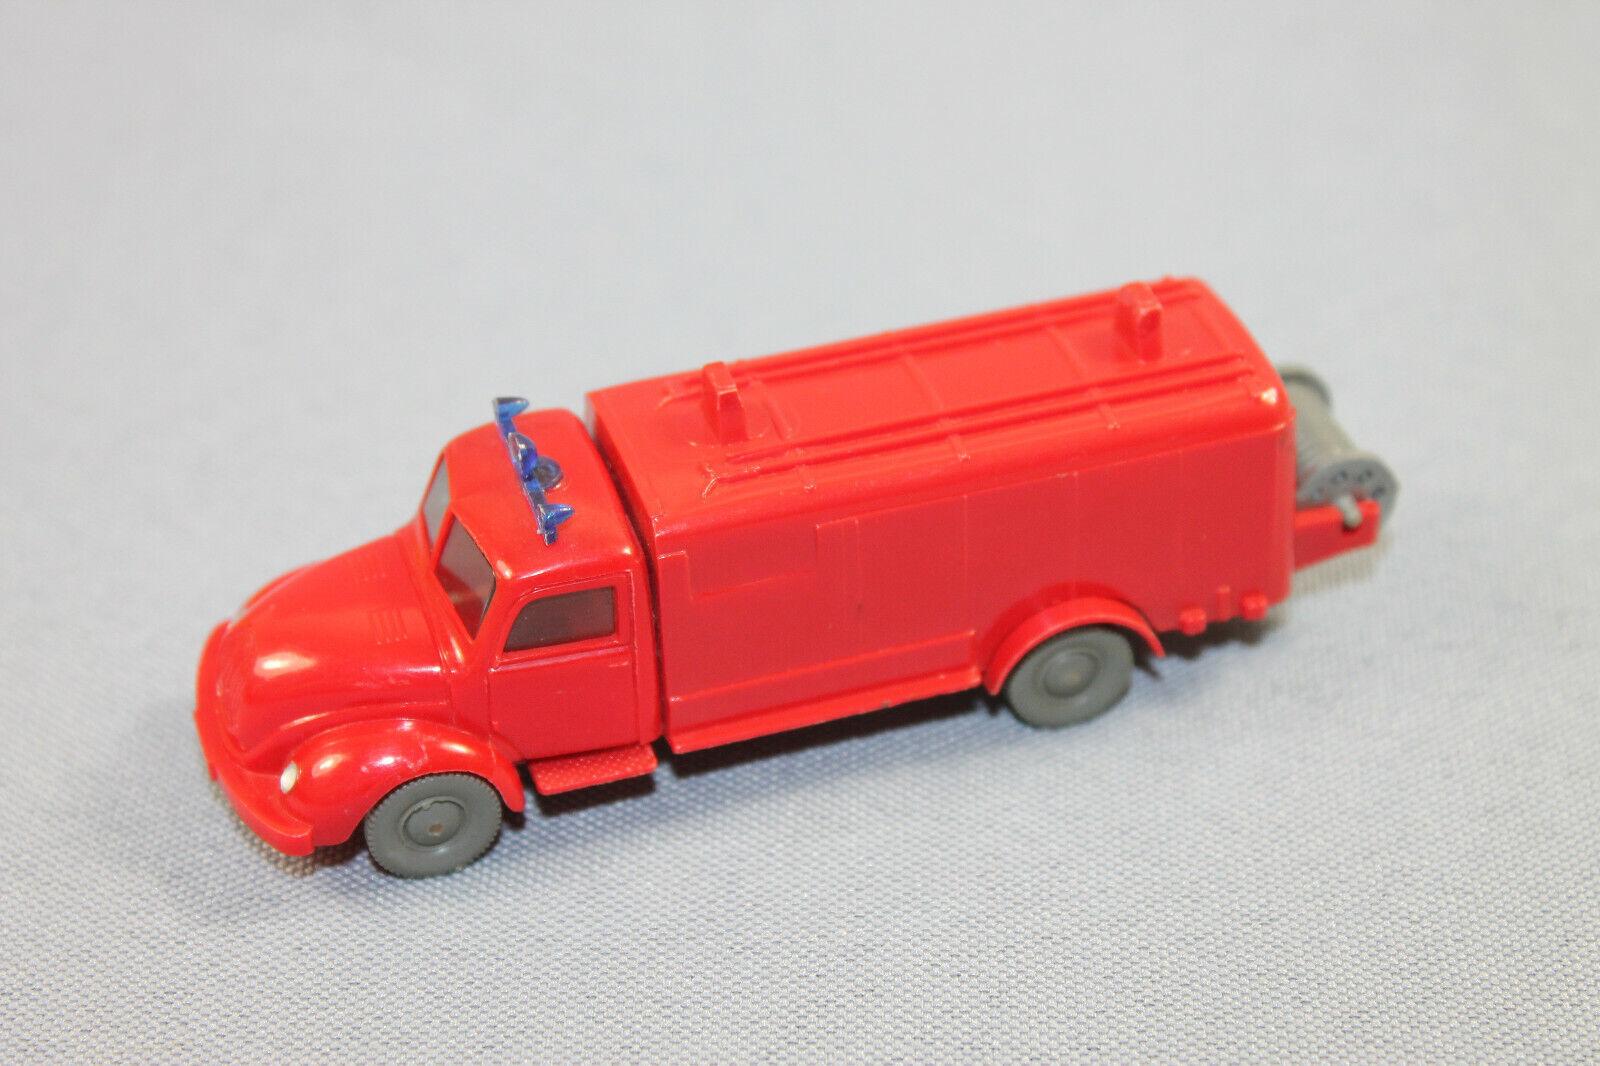 Wiking 1054 3  a Sybaguee voitureriage Magirus WM MIG Fire Brigade 1 87 Scale  meilleure mode